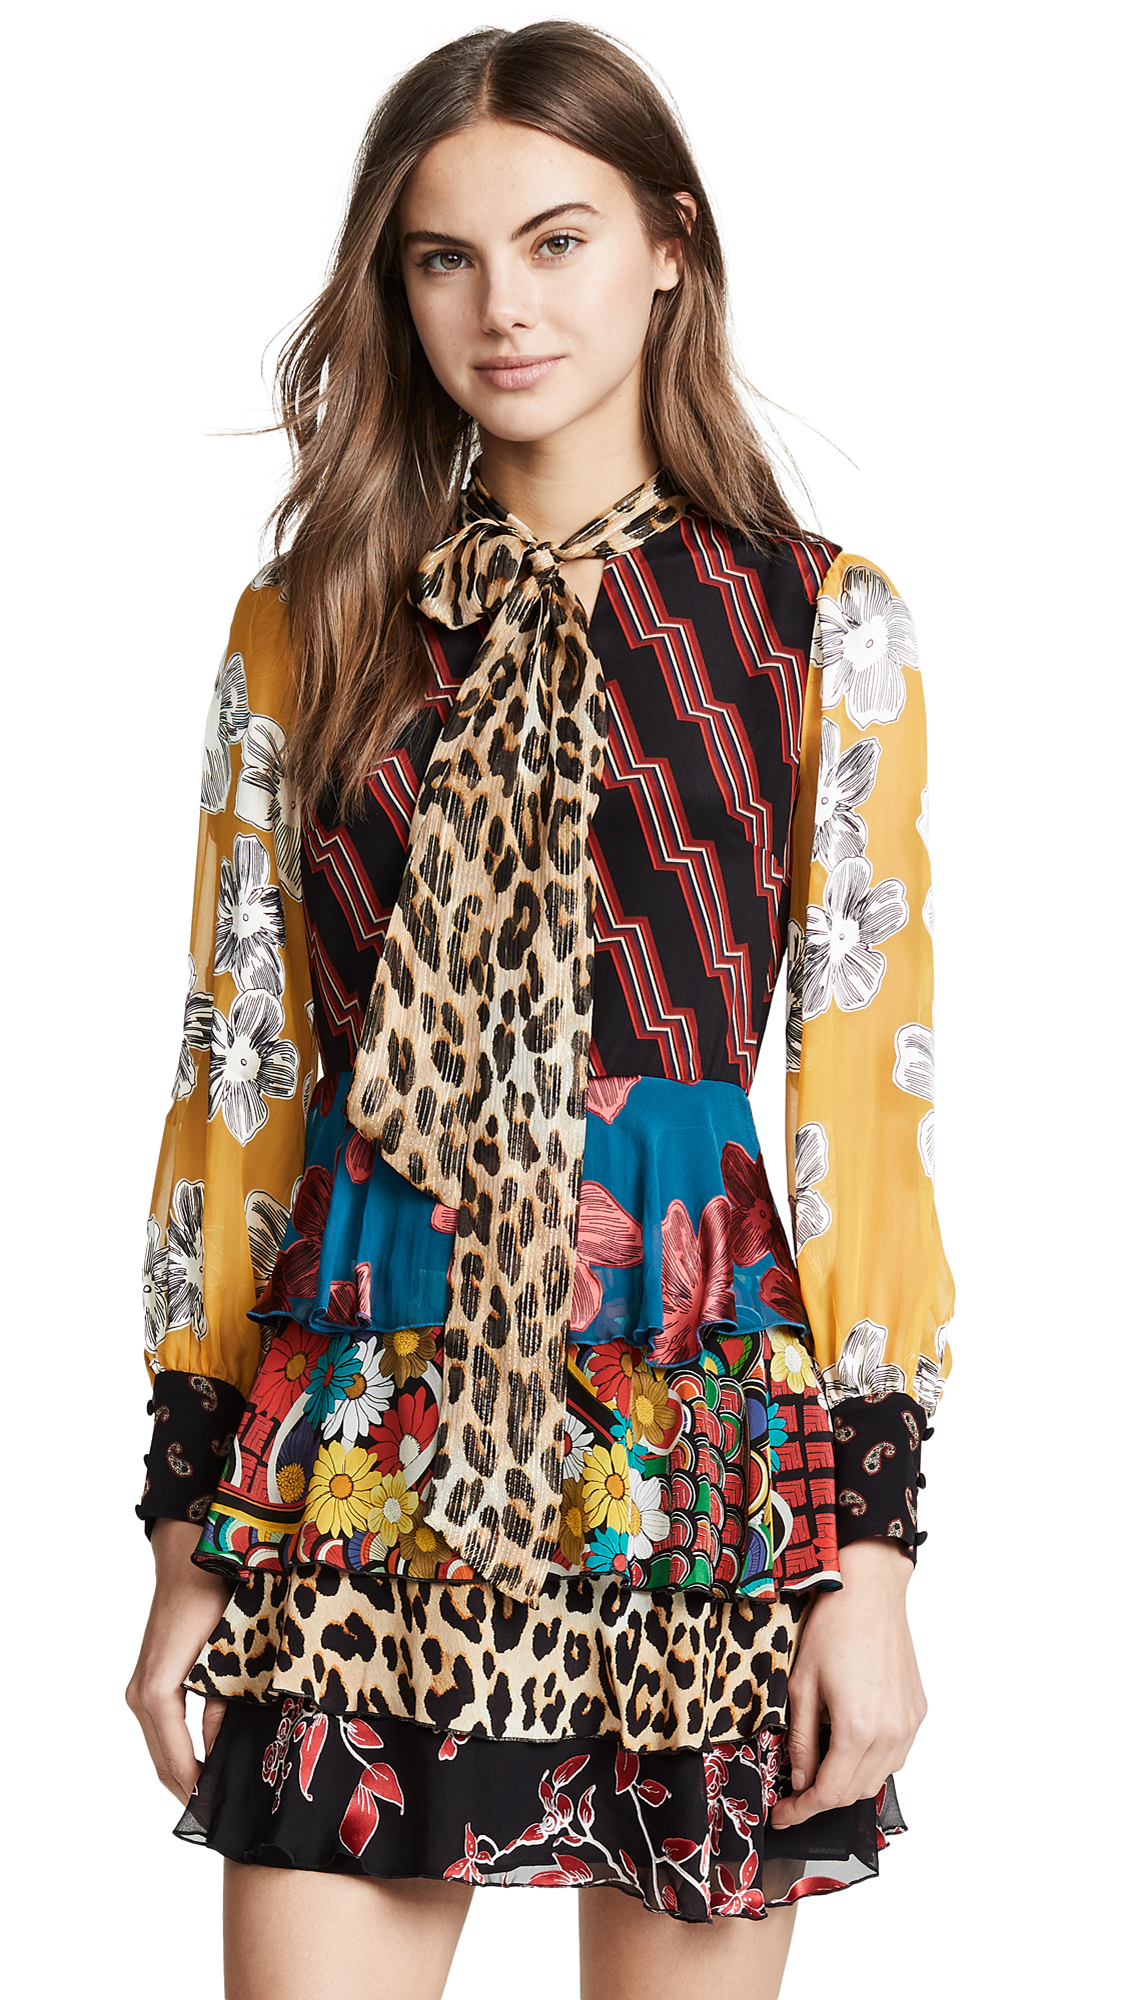 alice + olivia Dasha Tiered Ruffle Dress - Zigzag Stripe Black/Multi